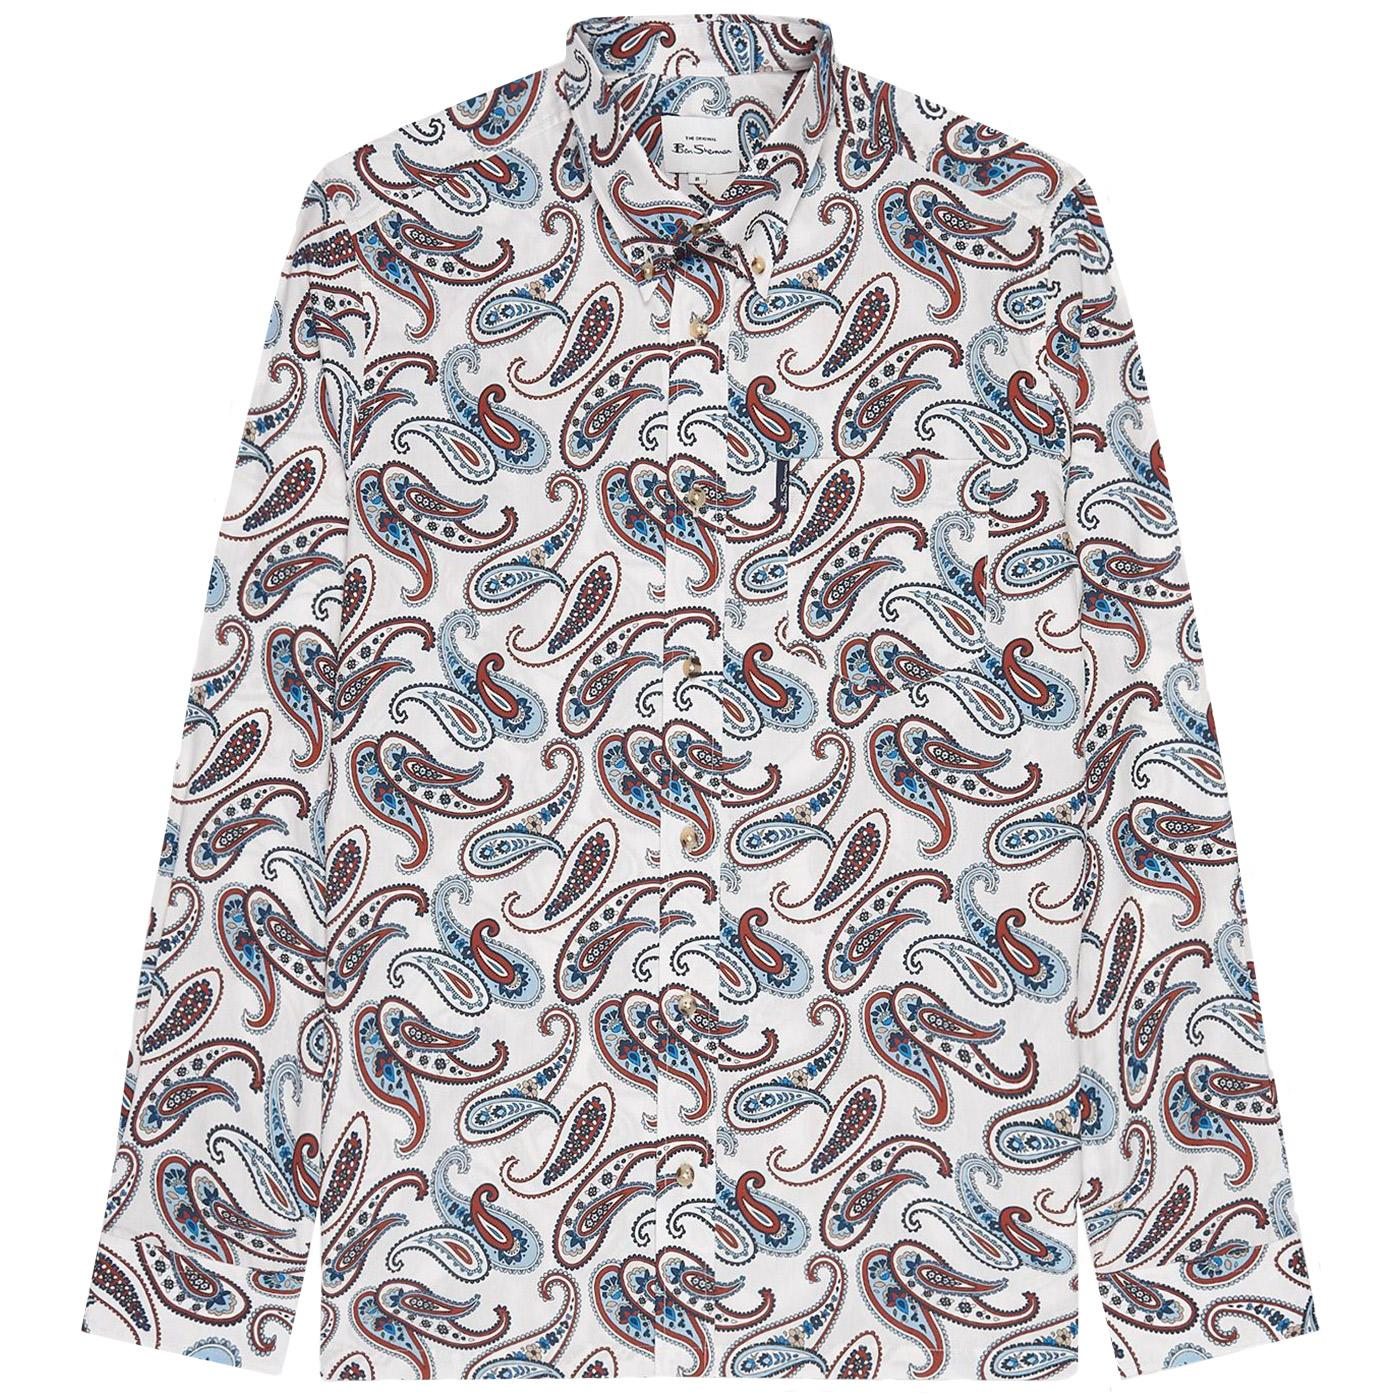 BEN SHERMAN Mod Large Paisley Print Shirt (Ivory)